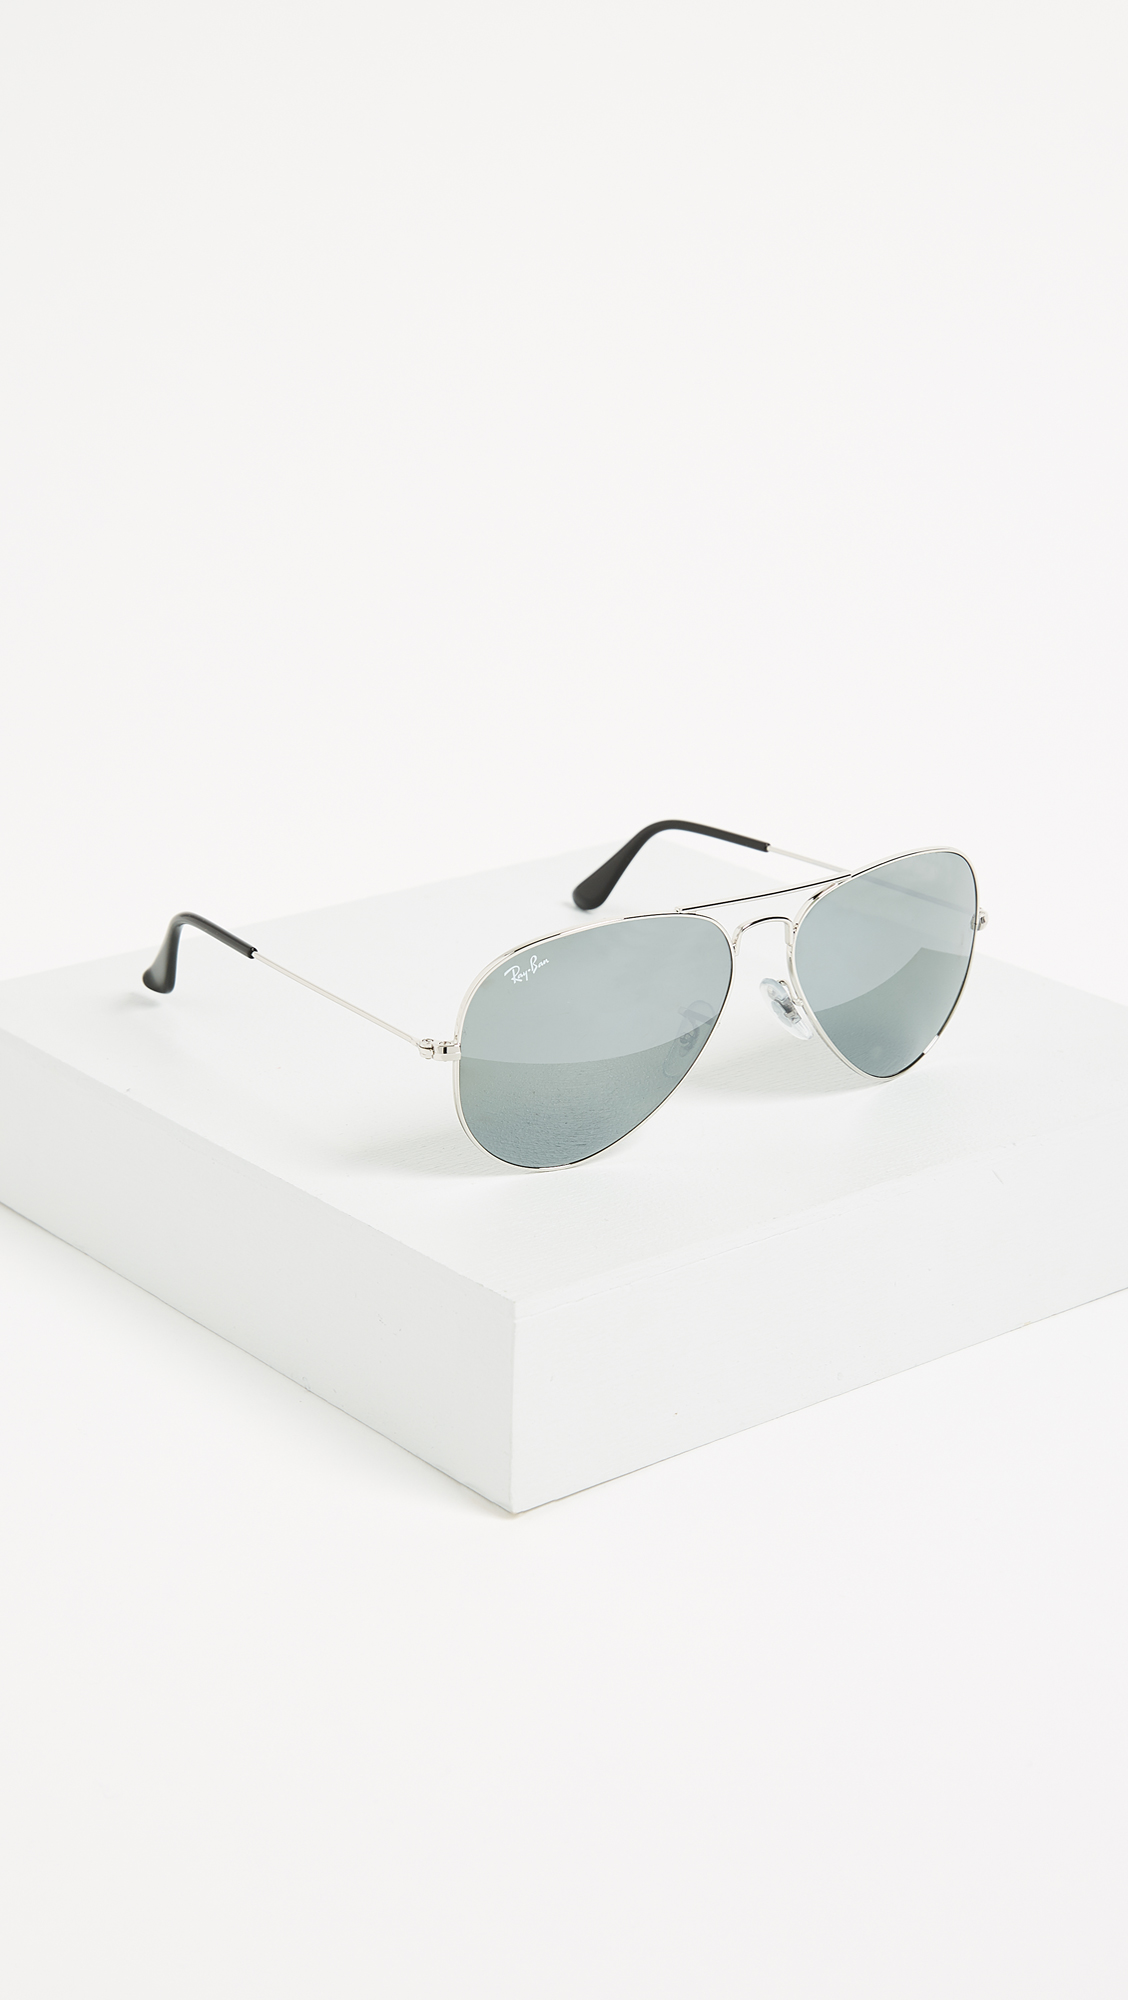 bbf5caee102e1c Ray-Ban Mirrored Original Aviator Sunglasses   SHOPBOP